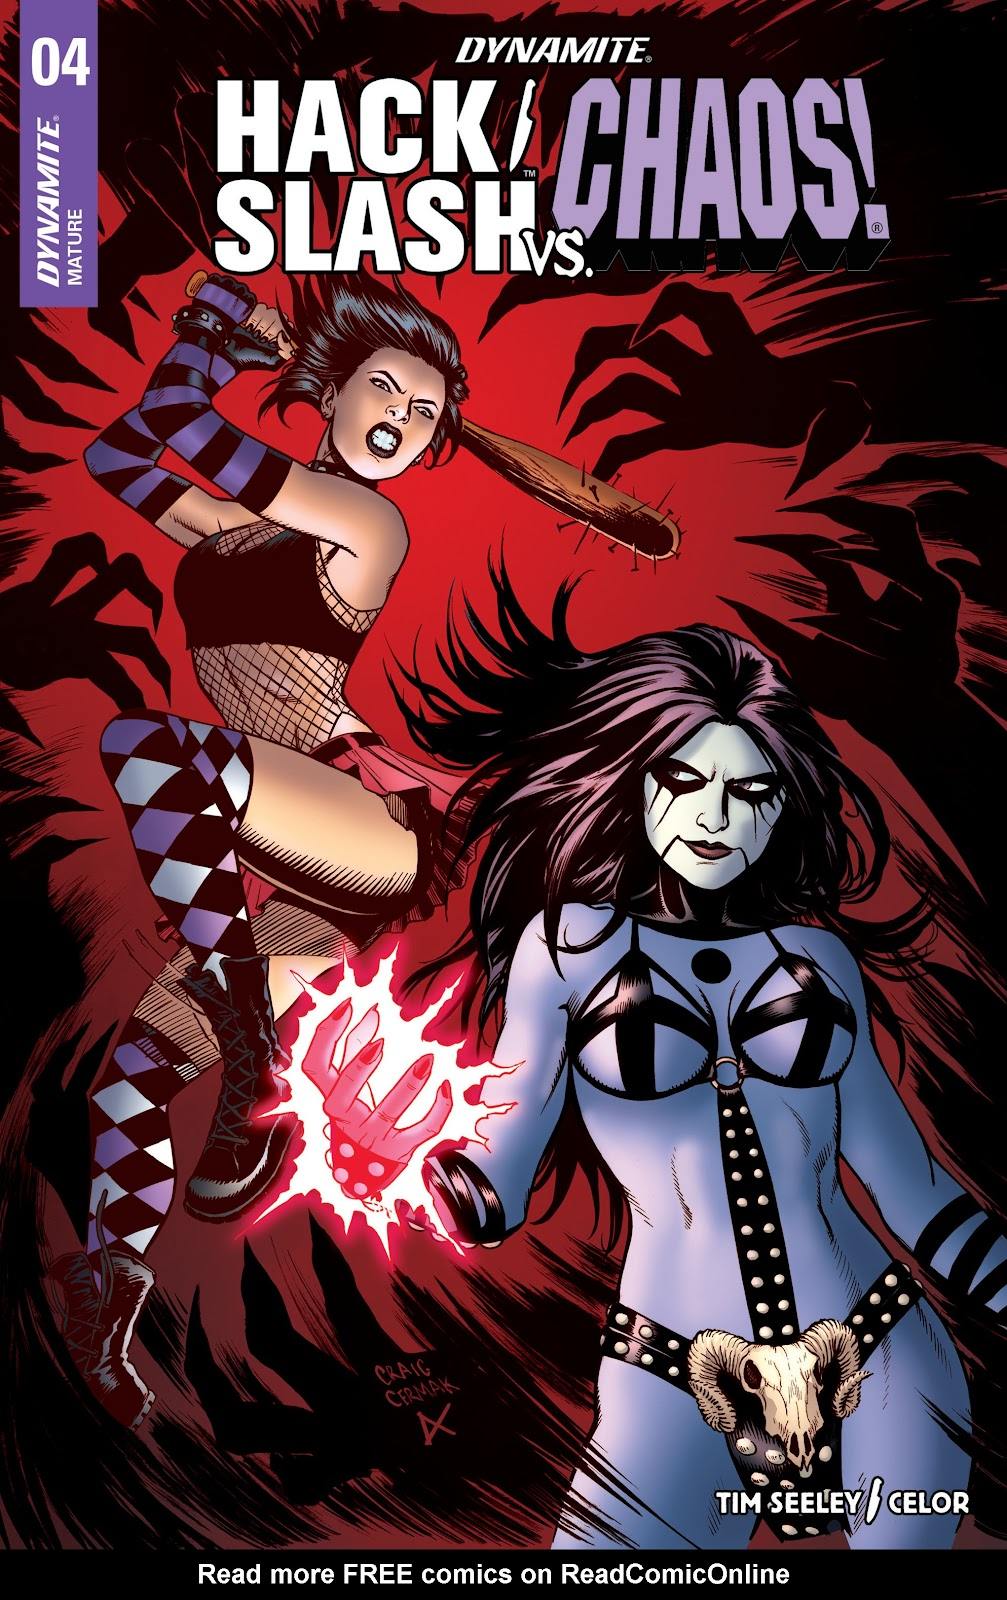 Read online Hack/Slash vs. Chaos comic -  Issue #4 - 2